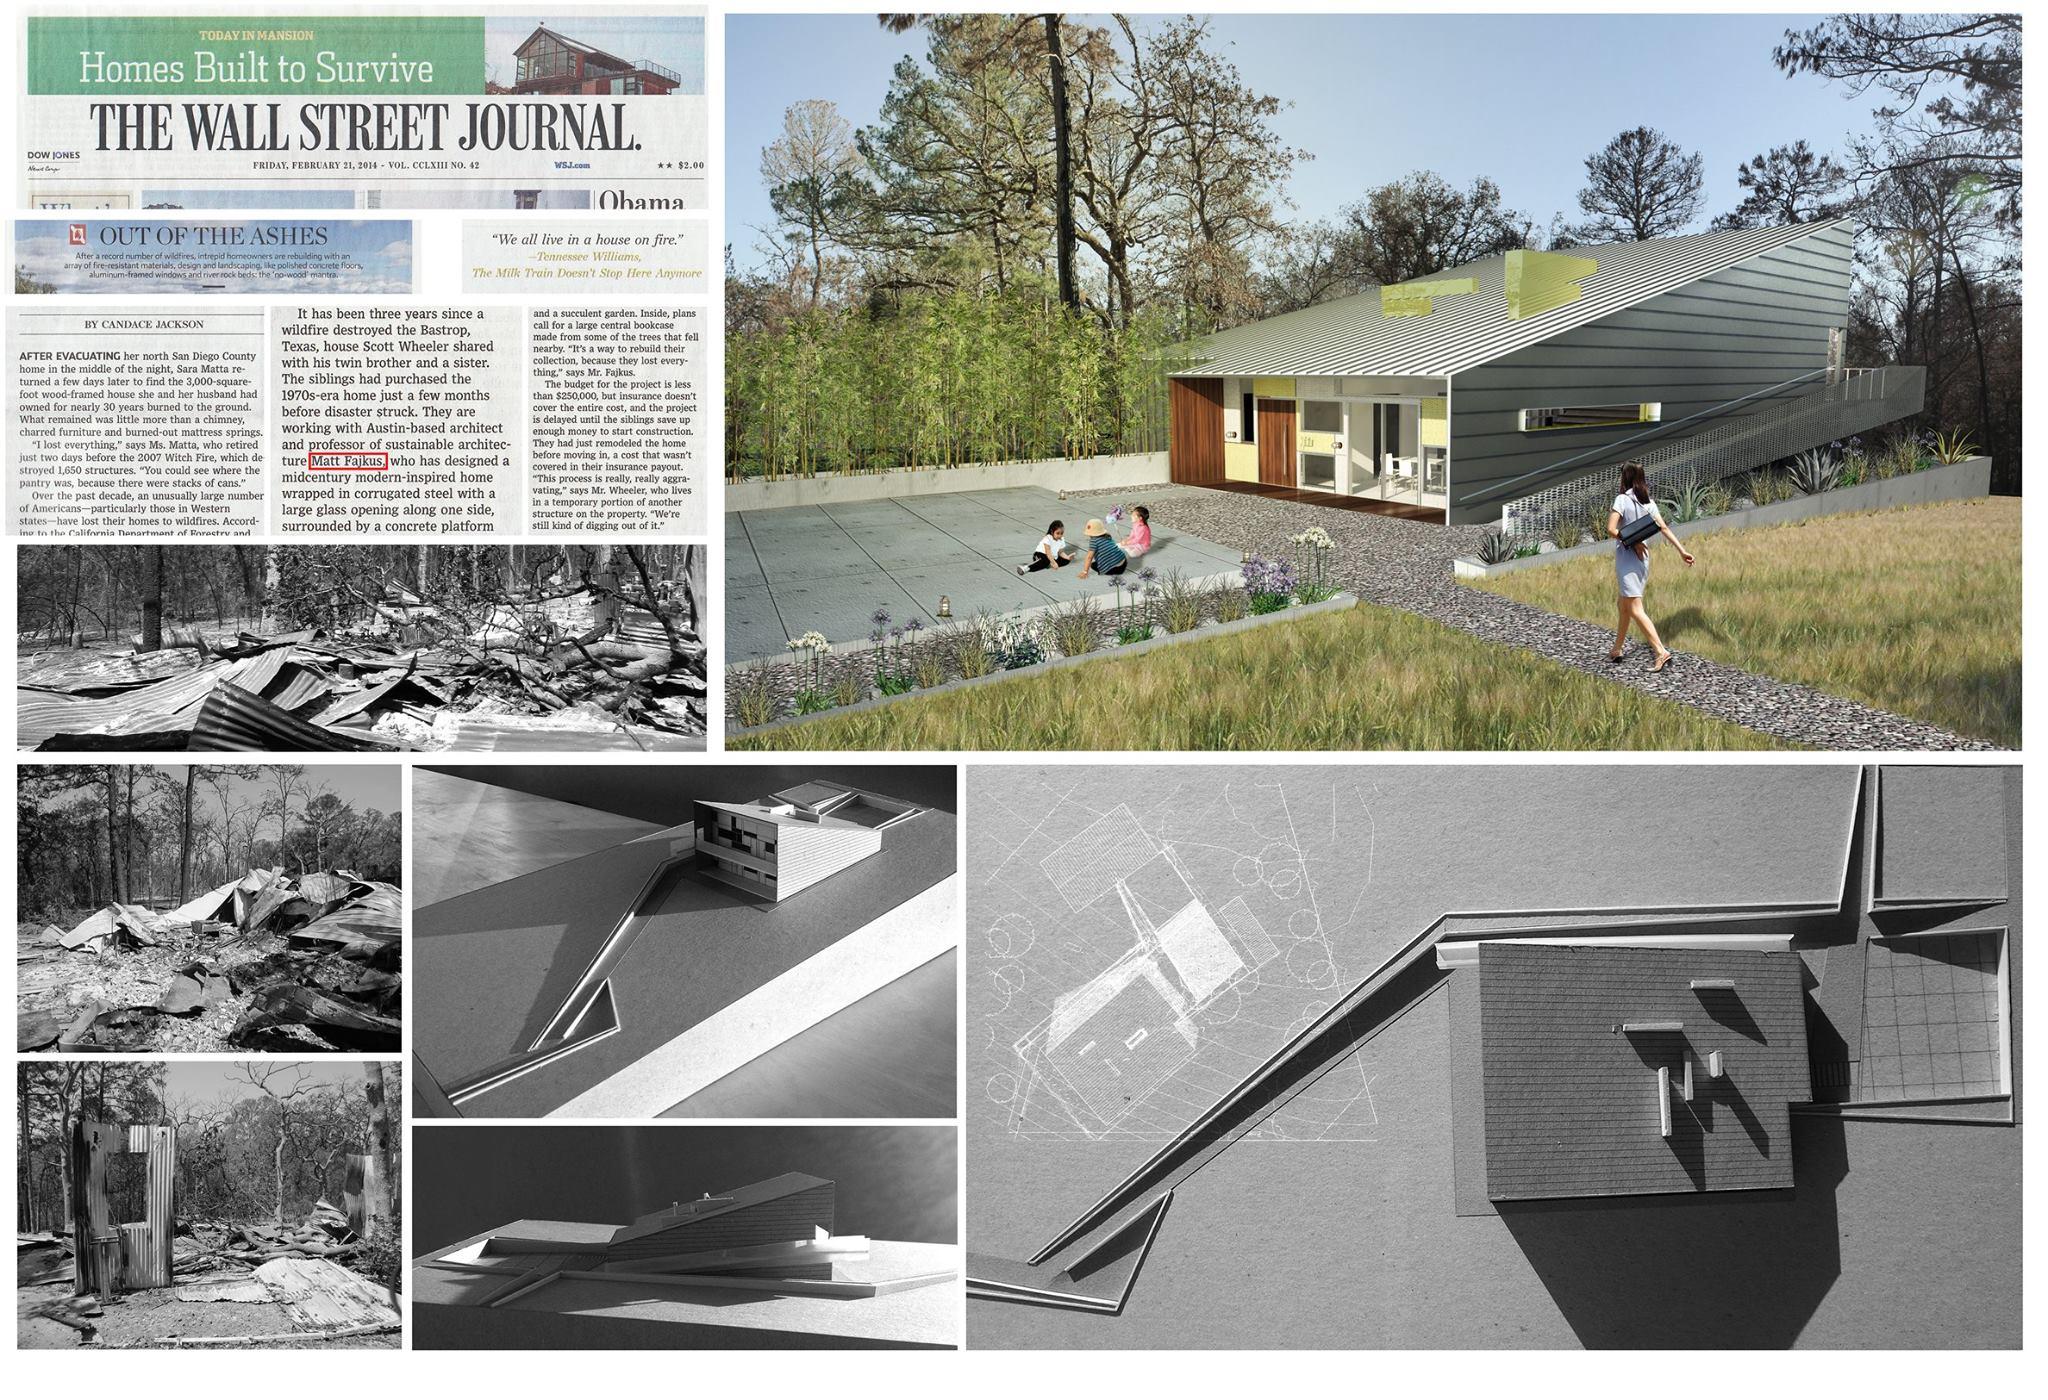 2014_0224 Matt Fajkus MF Architecture Wall Street Journal Lost Pines House.jpg